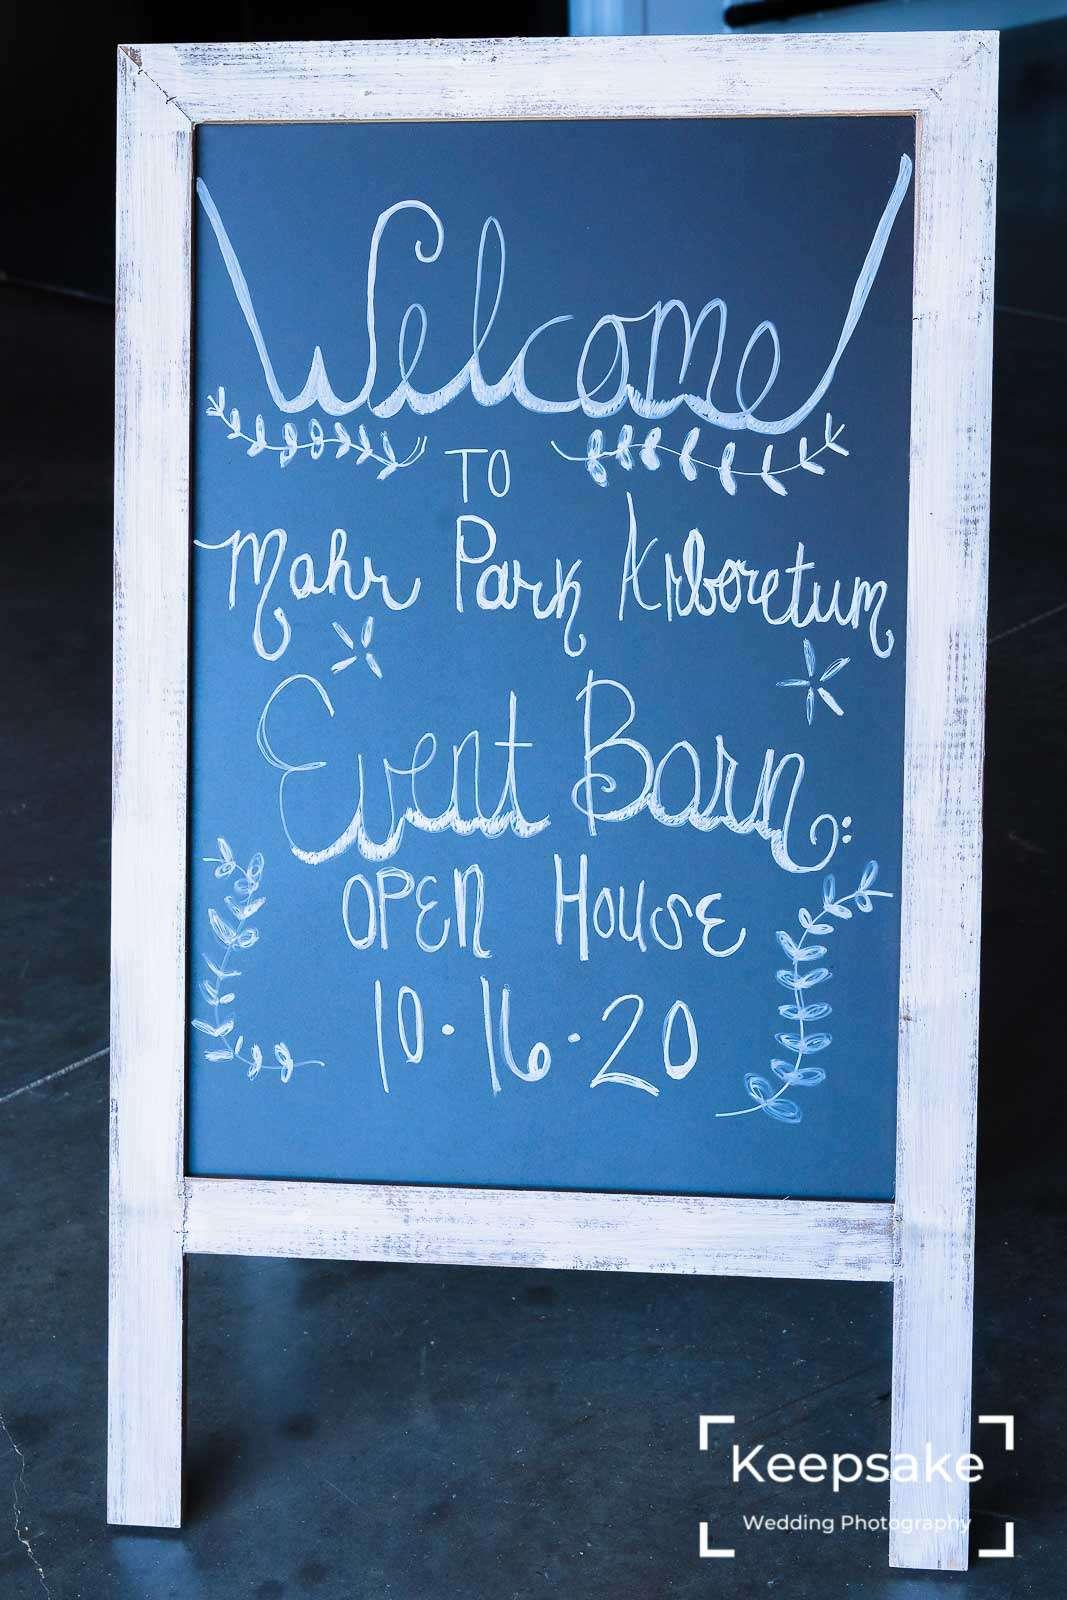 The Event Barn at Mahr Park Arboretum Open House - Keepsake Wedding Photography-22